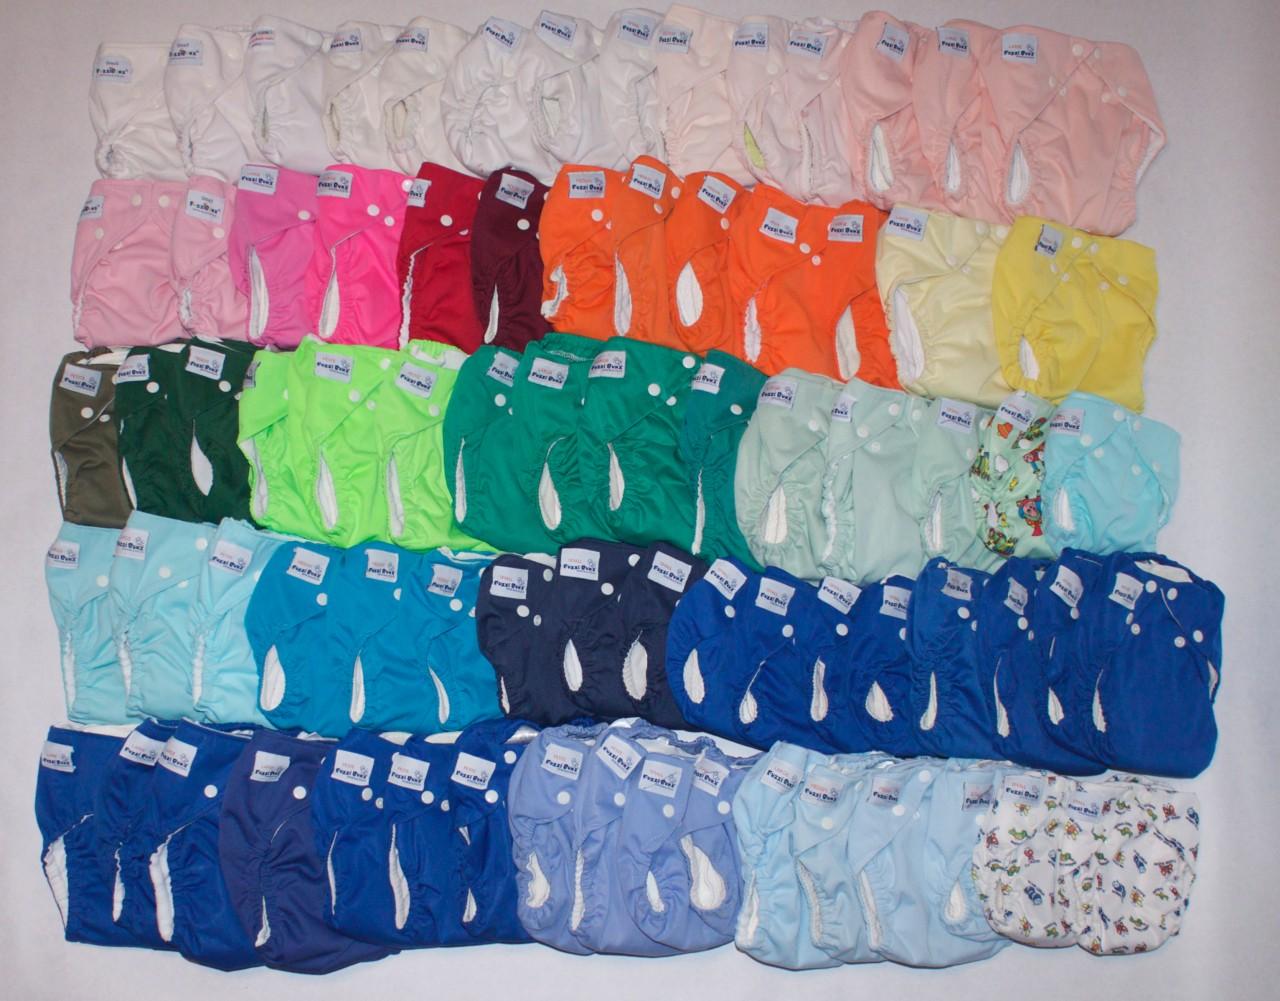 Fuzzi Bunz Cloth Diapers Small Medium Large Petite